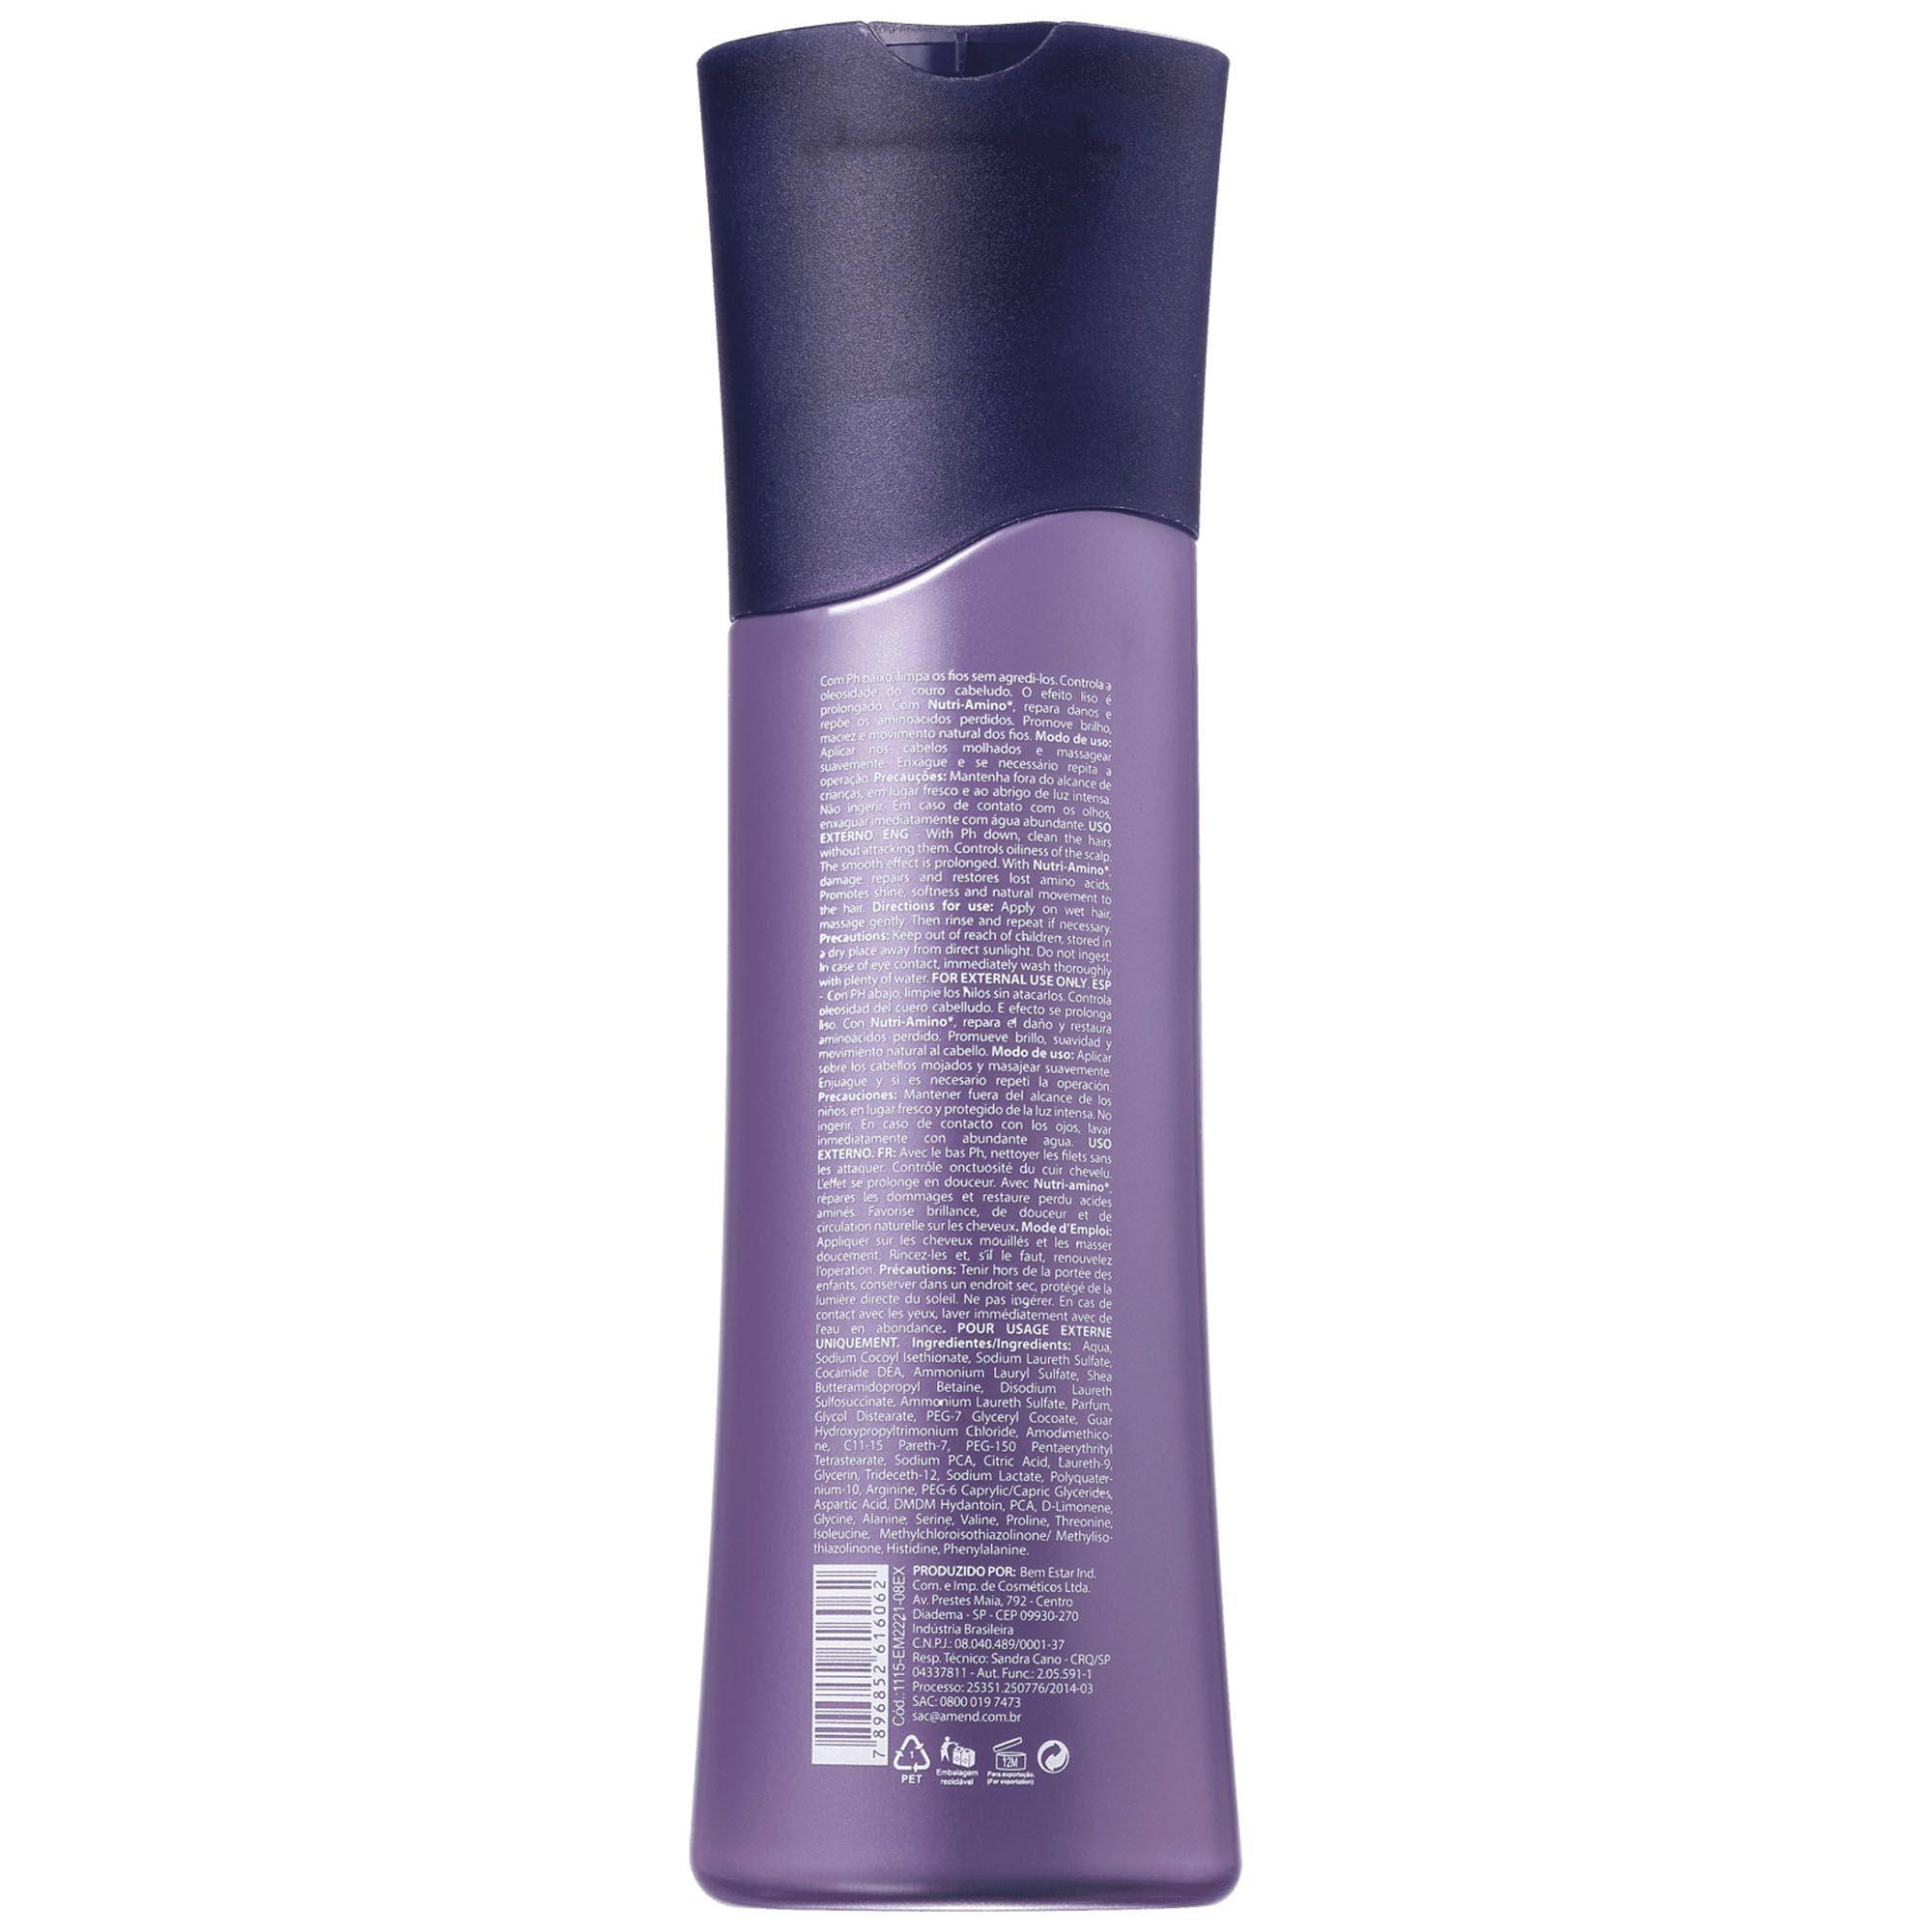 Shampoo Intensificador Pós Progressiva - 250ml Amend